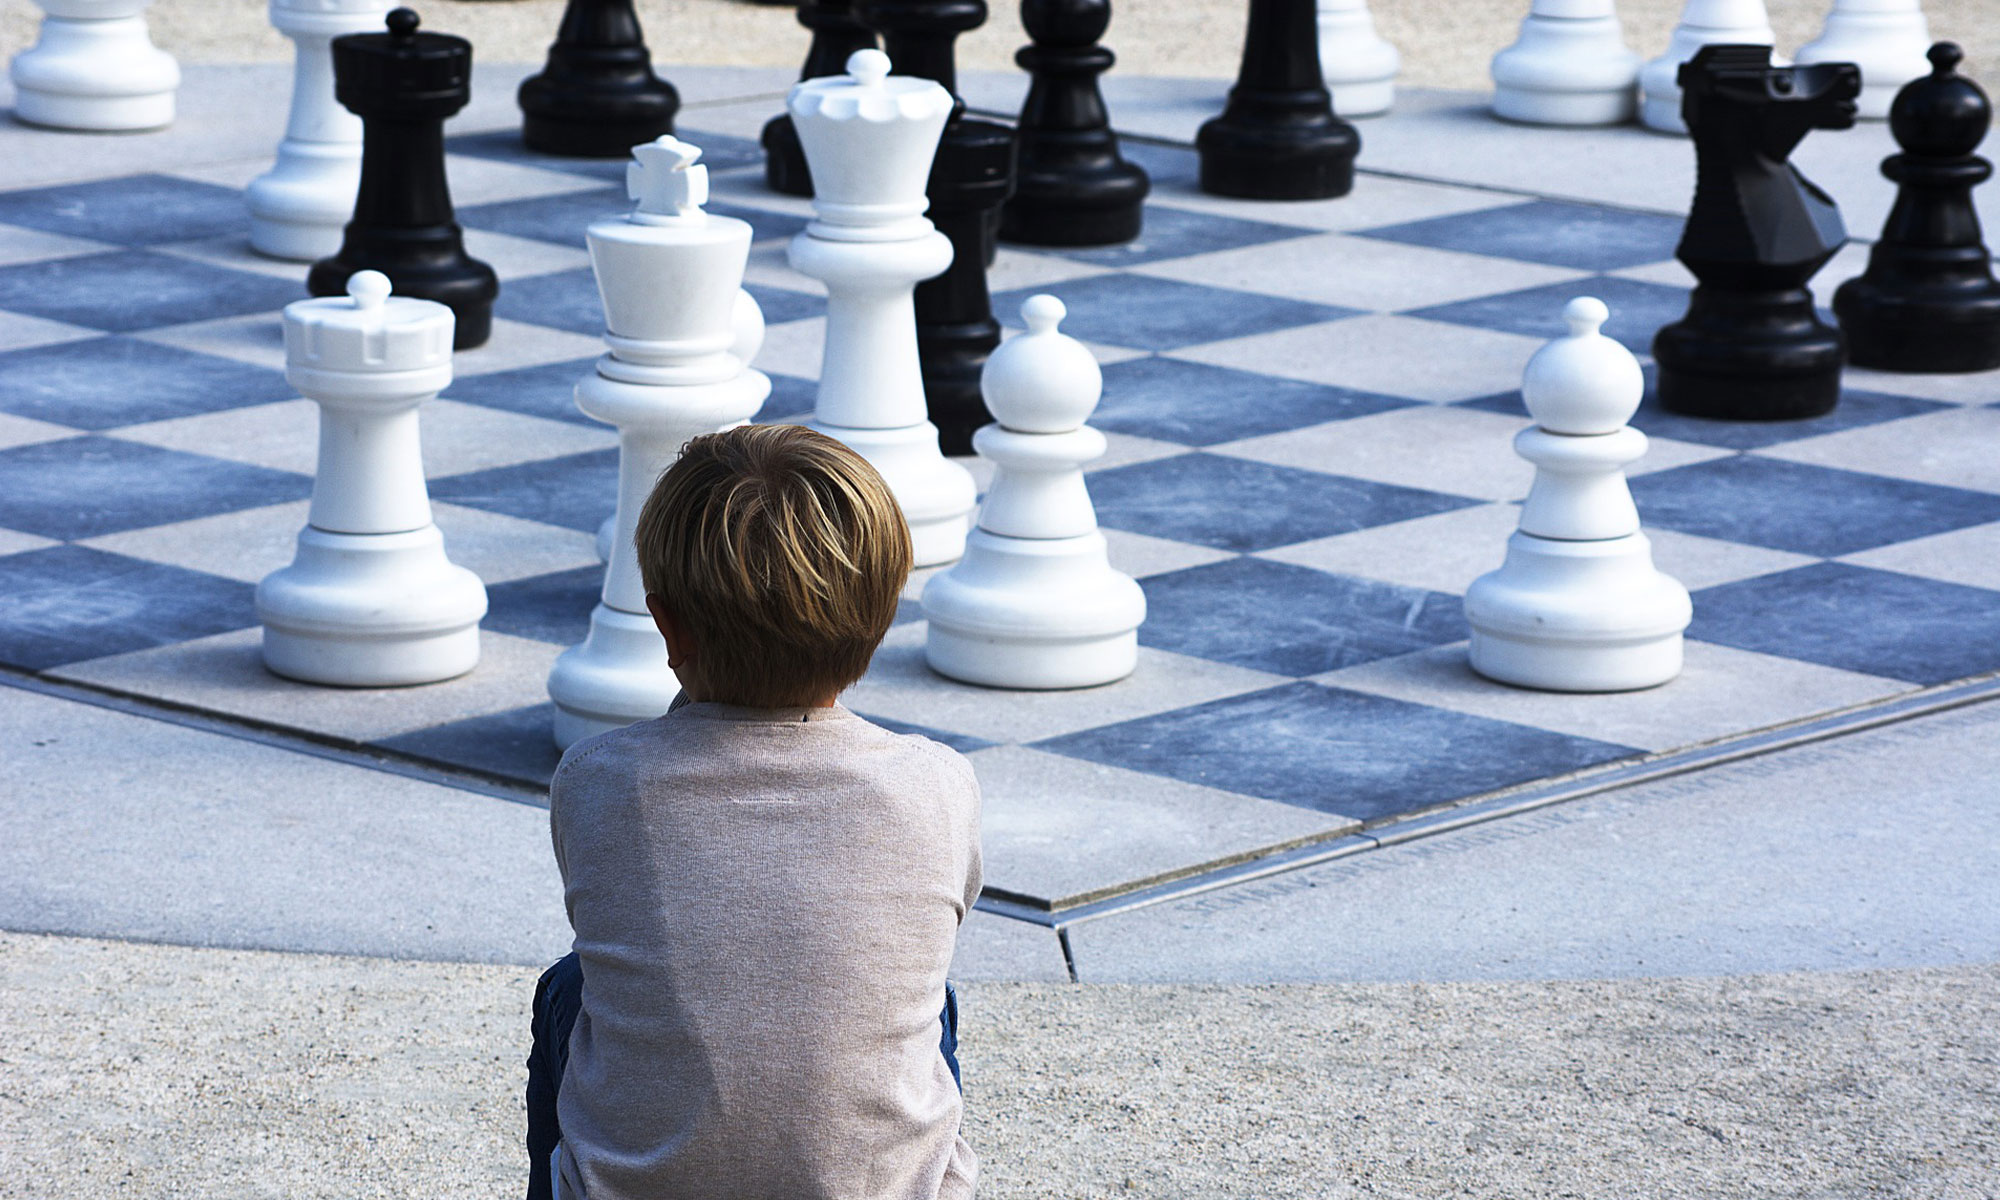 Circolo scacchi imola - albo d'oro